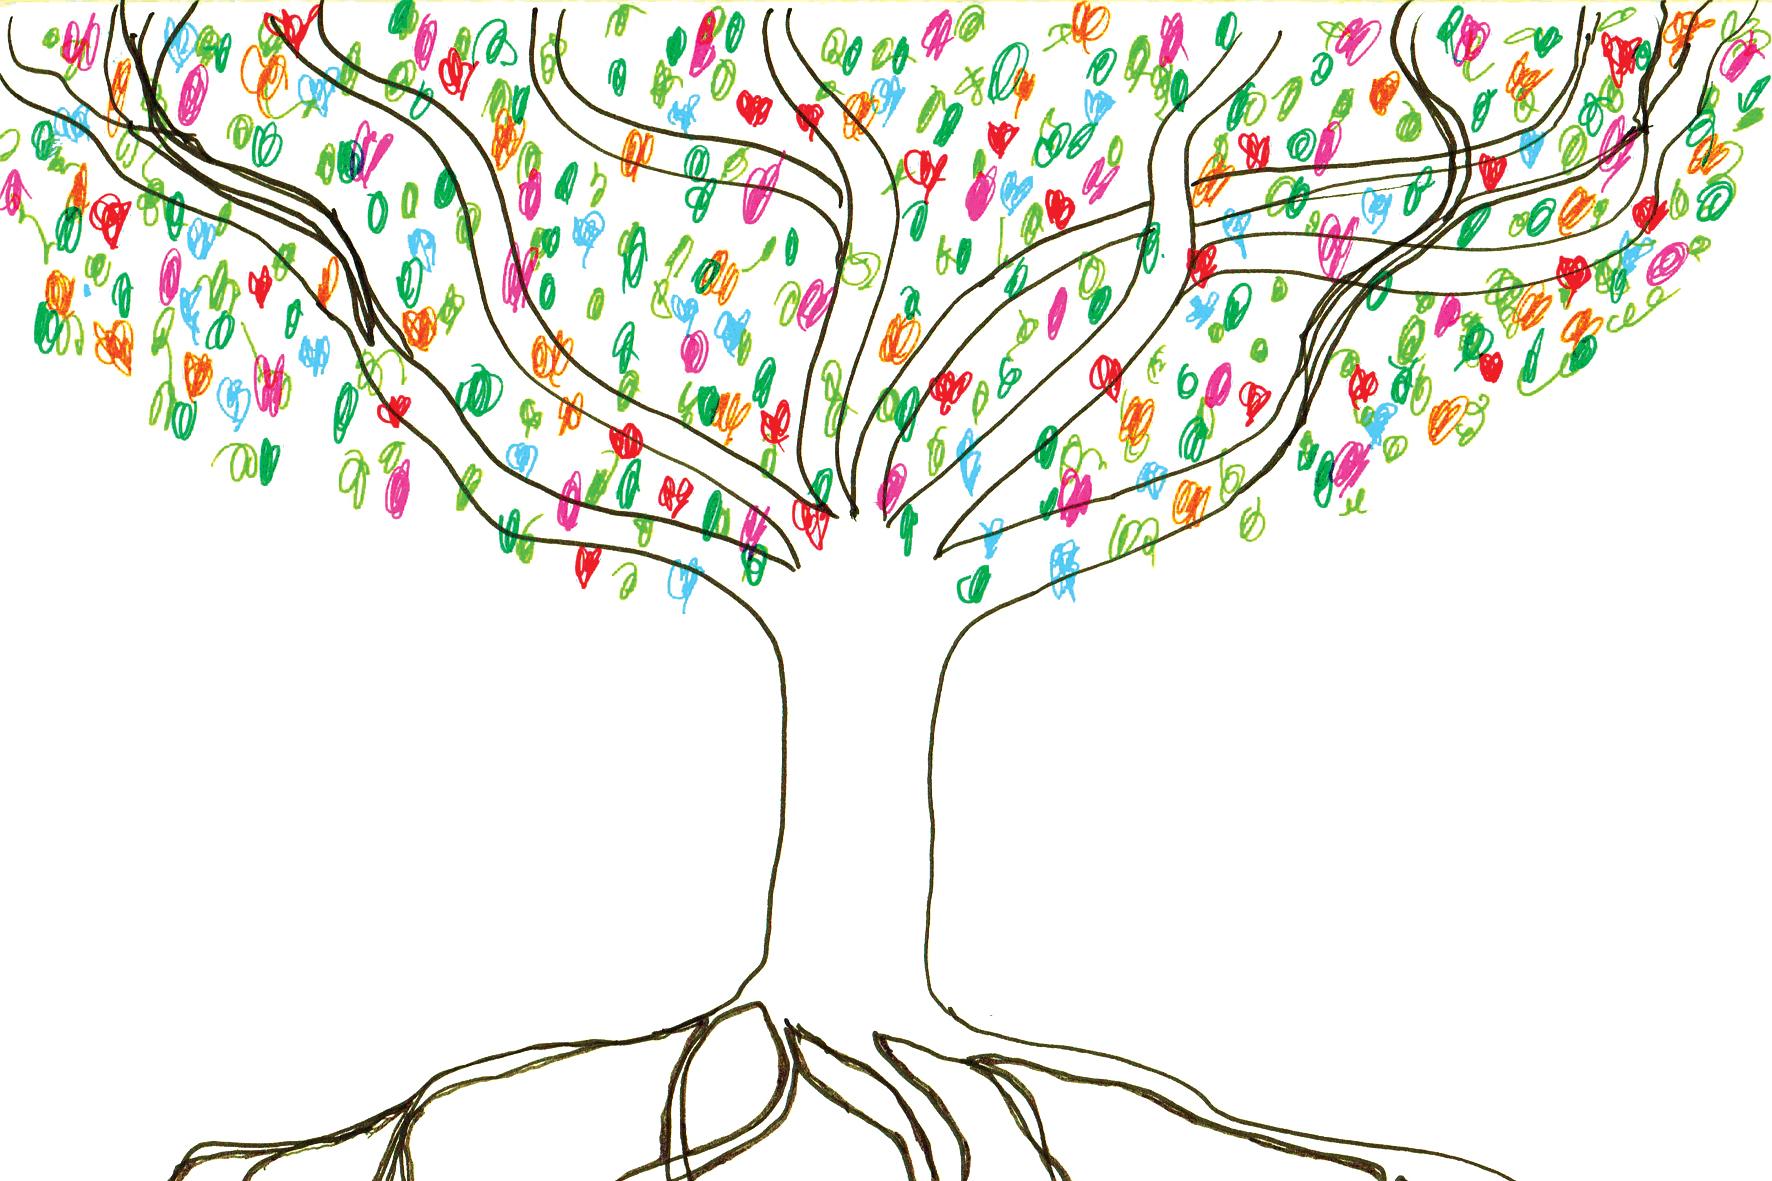 The Friendship Tree - Illustration Luke Hockley